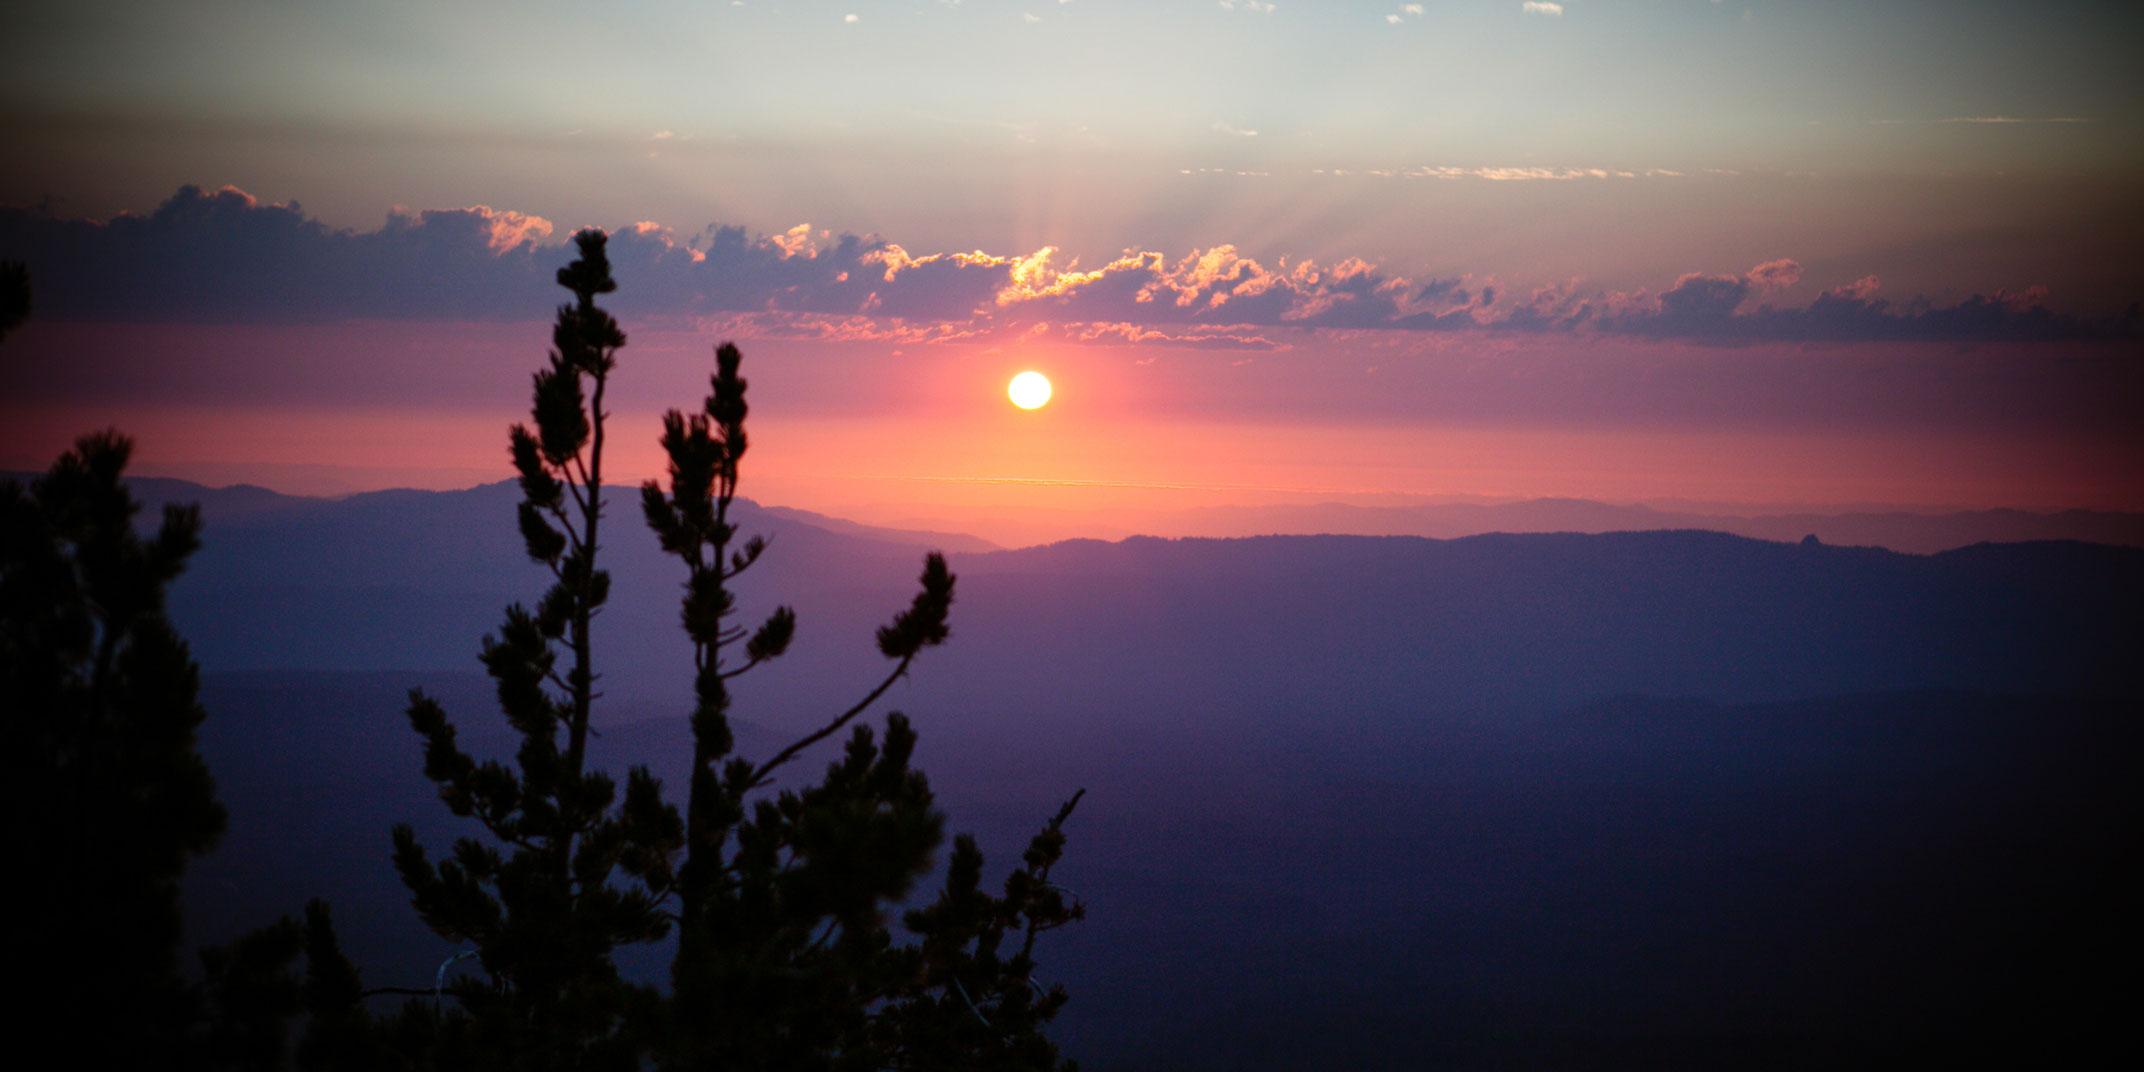 epic sunset@x